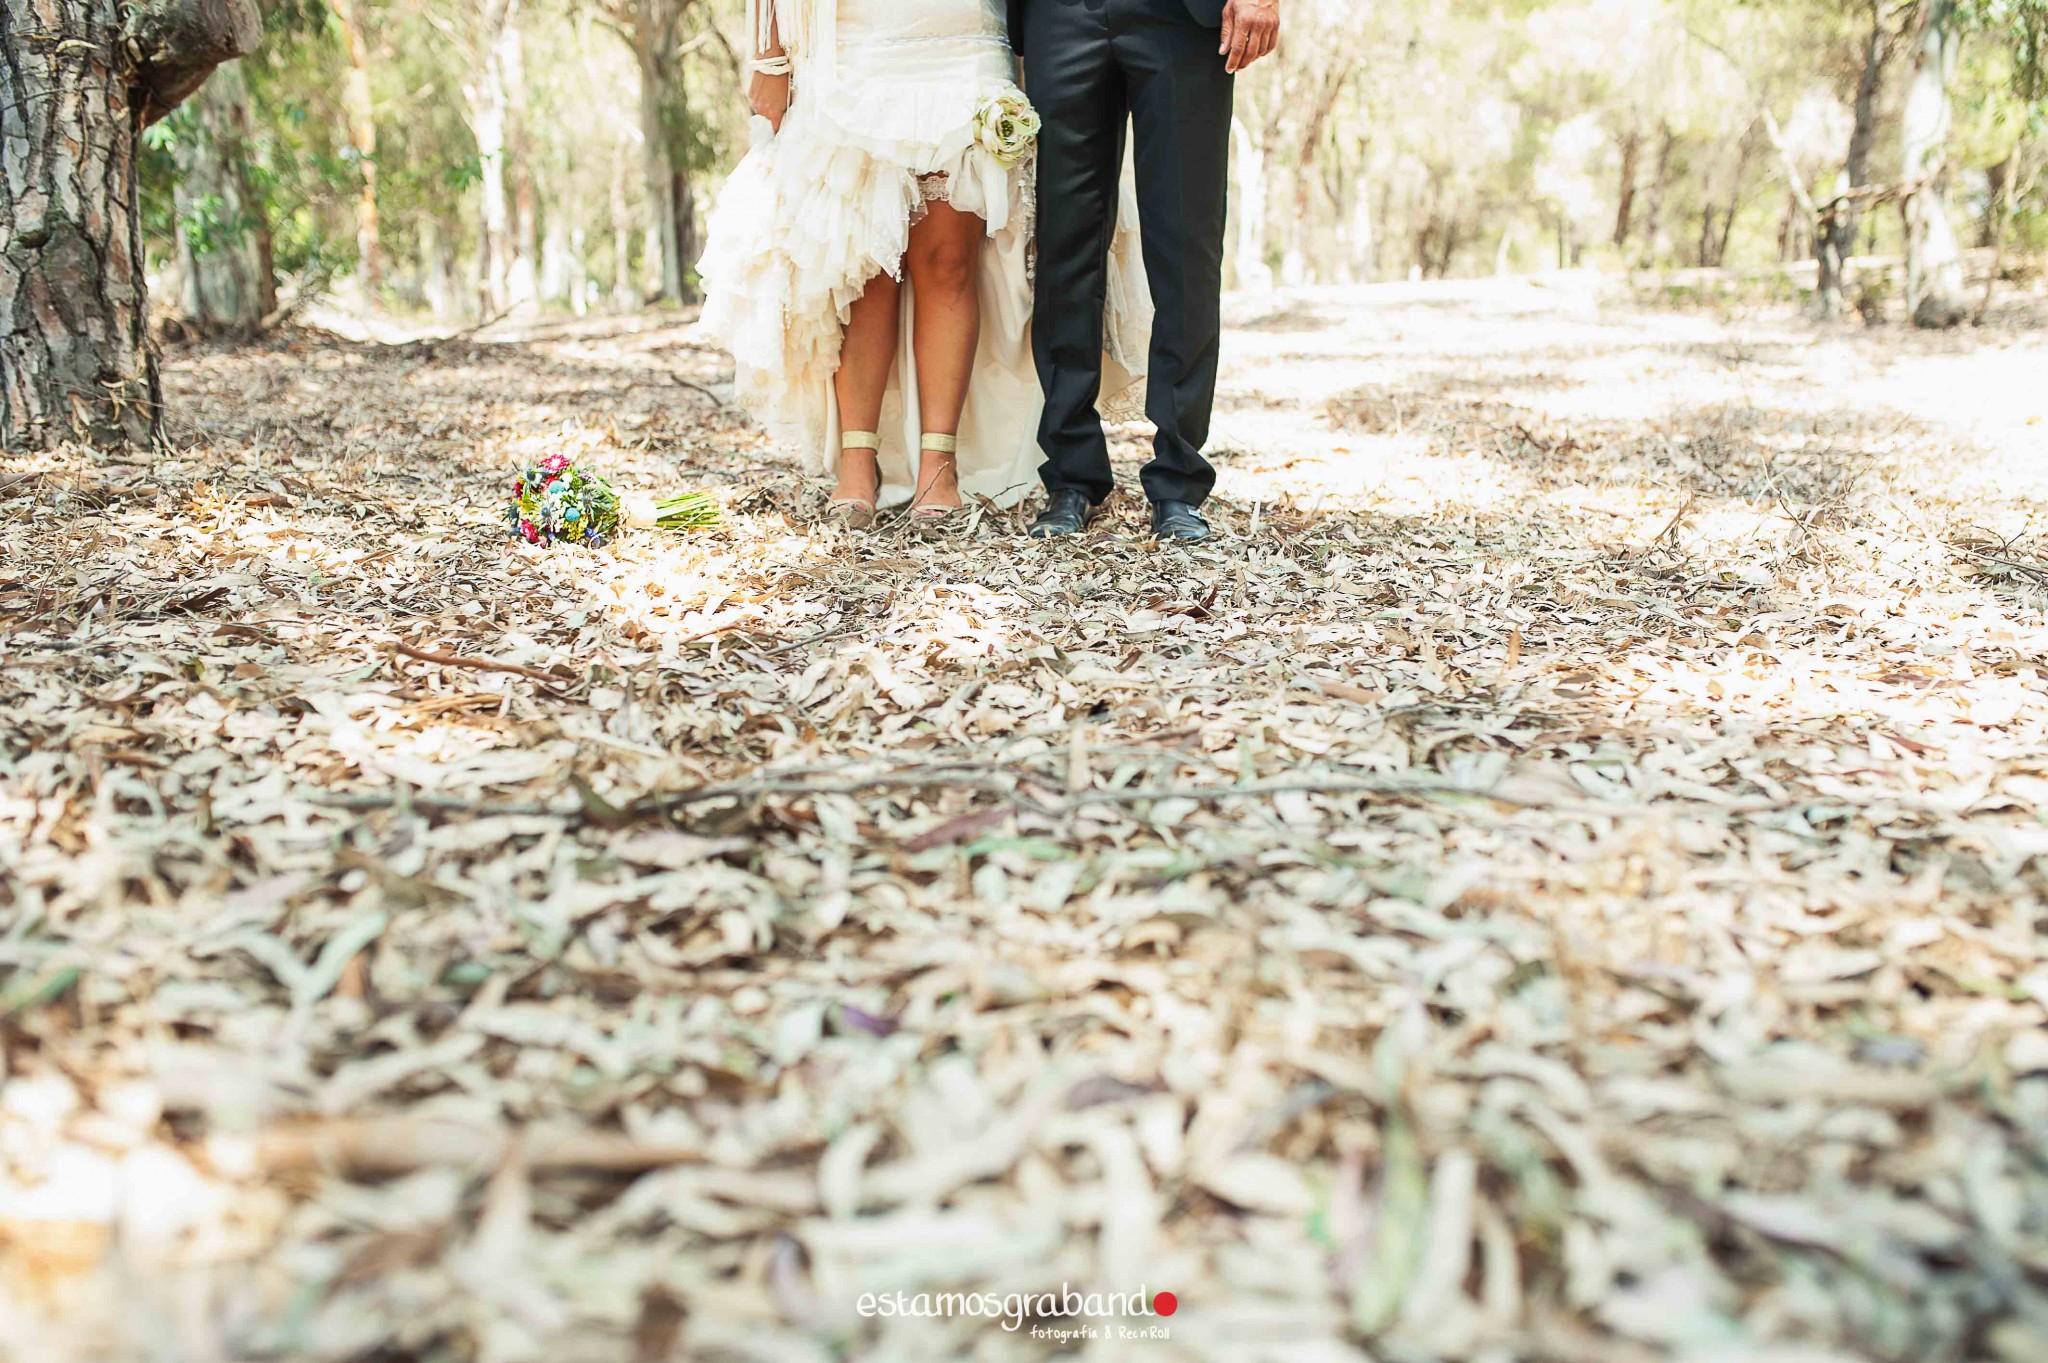 pili-y-jose_fotograficc81a-cadiz-71 Pili & Jose - video boda cadiz